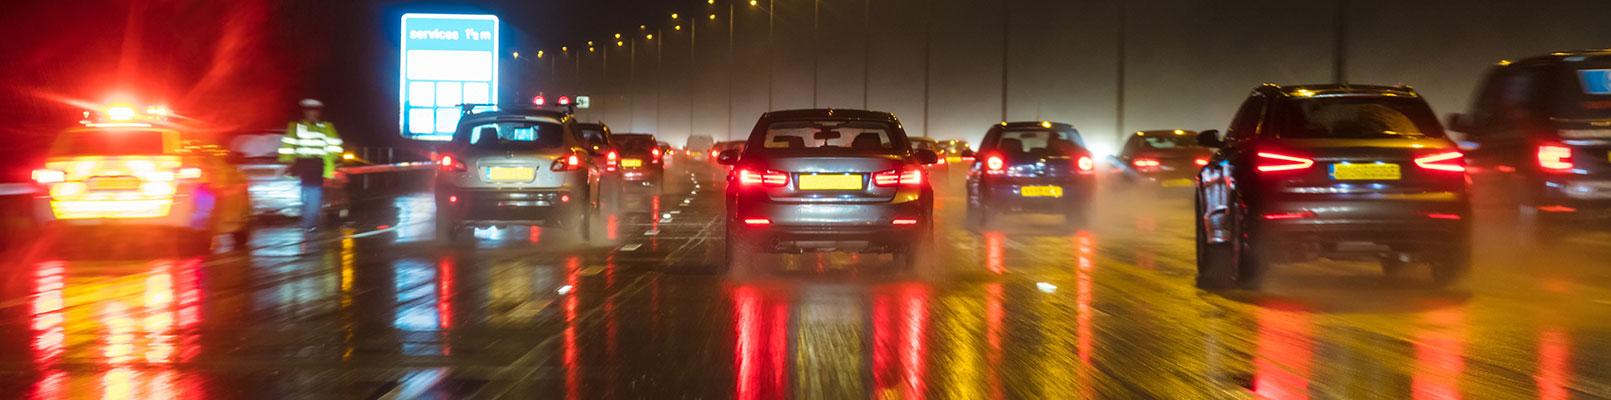 Window screen view of traffic ahead on a rainy motorway